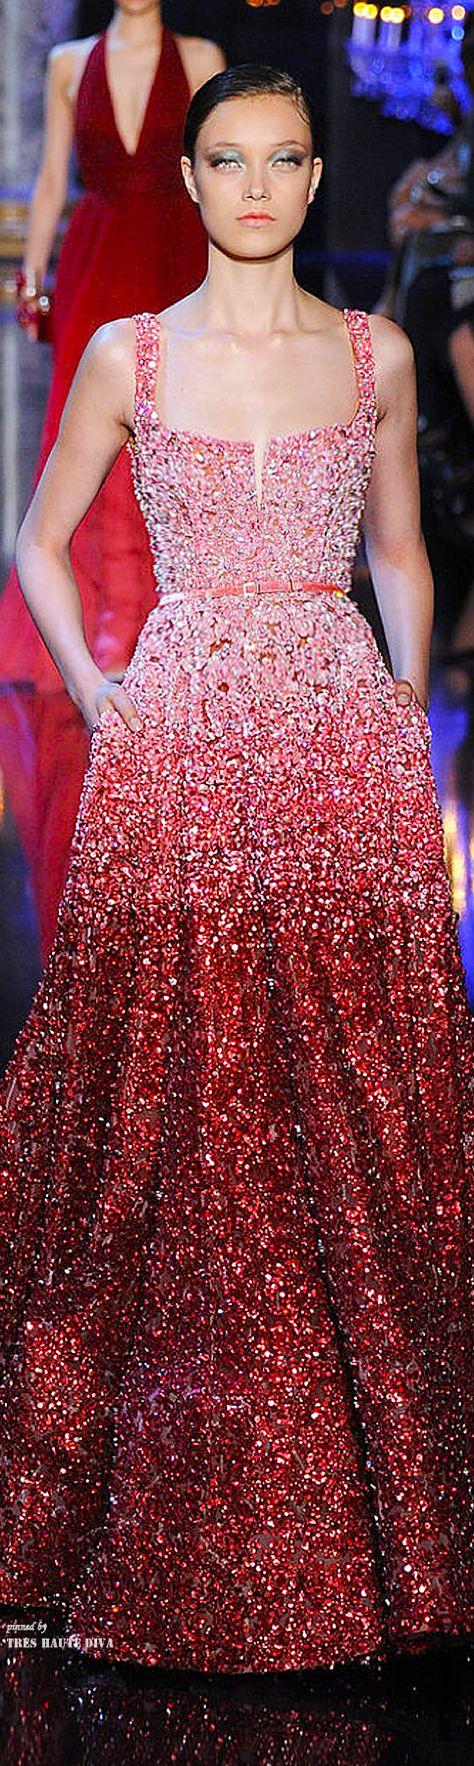 Elie Saab Haute Couture Fall 2014 #HauteCouture